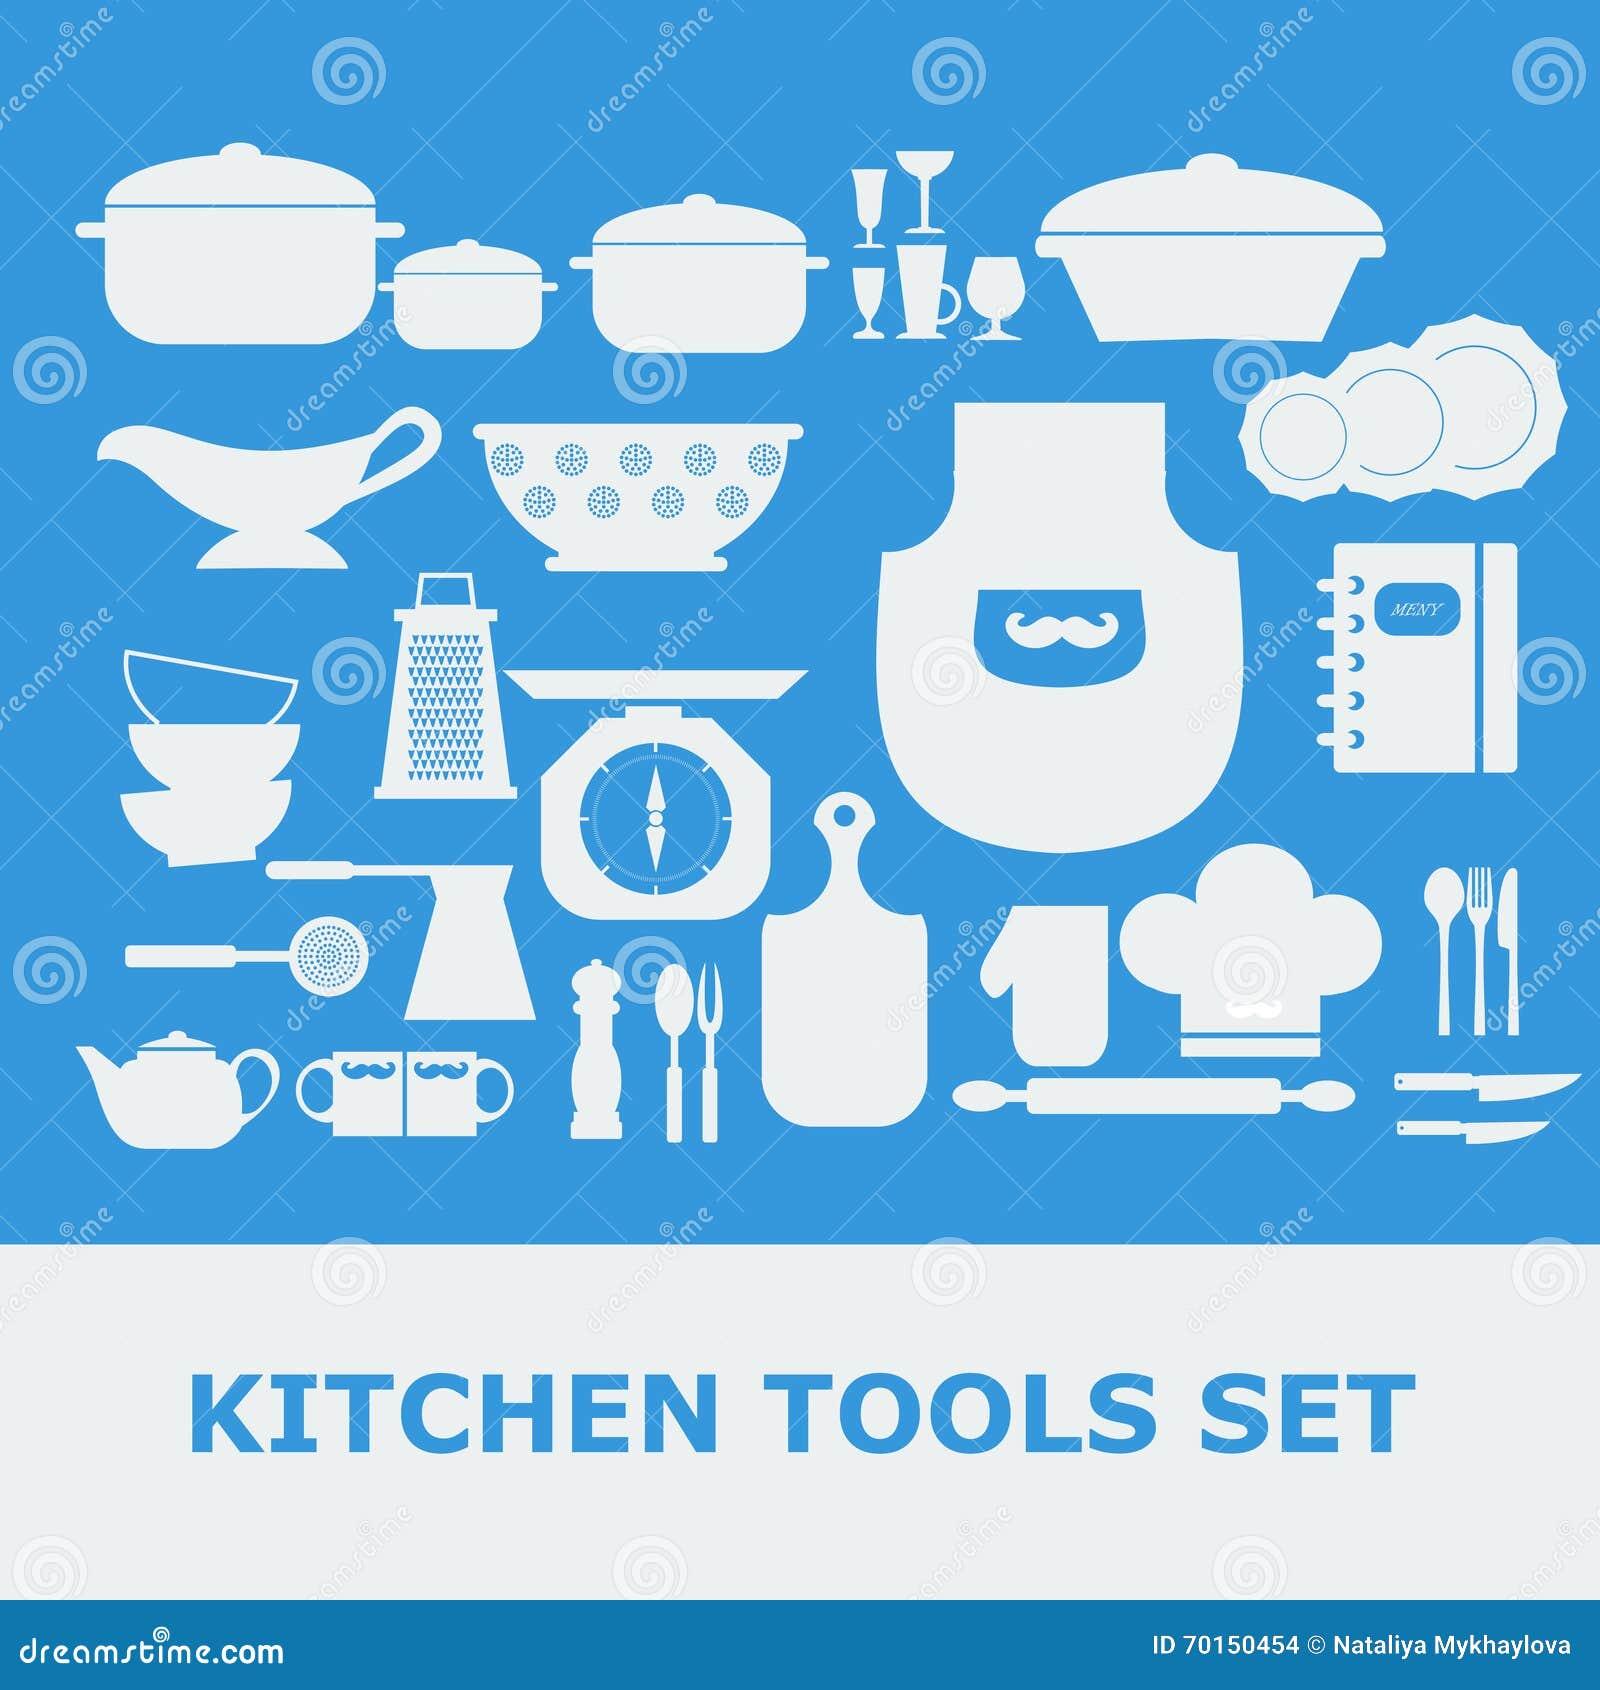 Kitchen Tools White Silhouette Vector Icons Set Stock Illustration ...